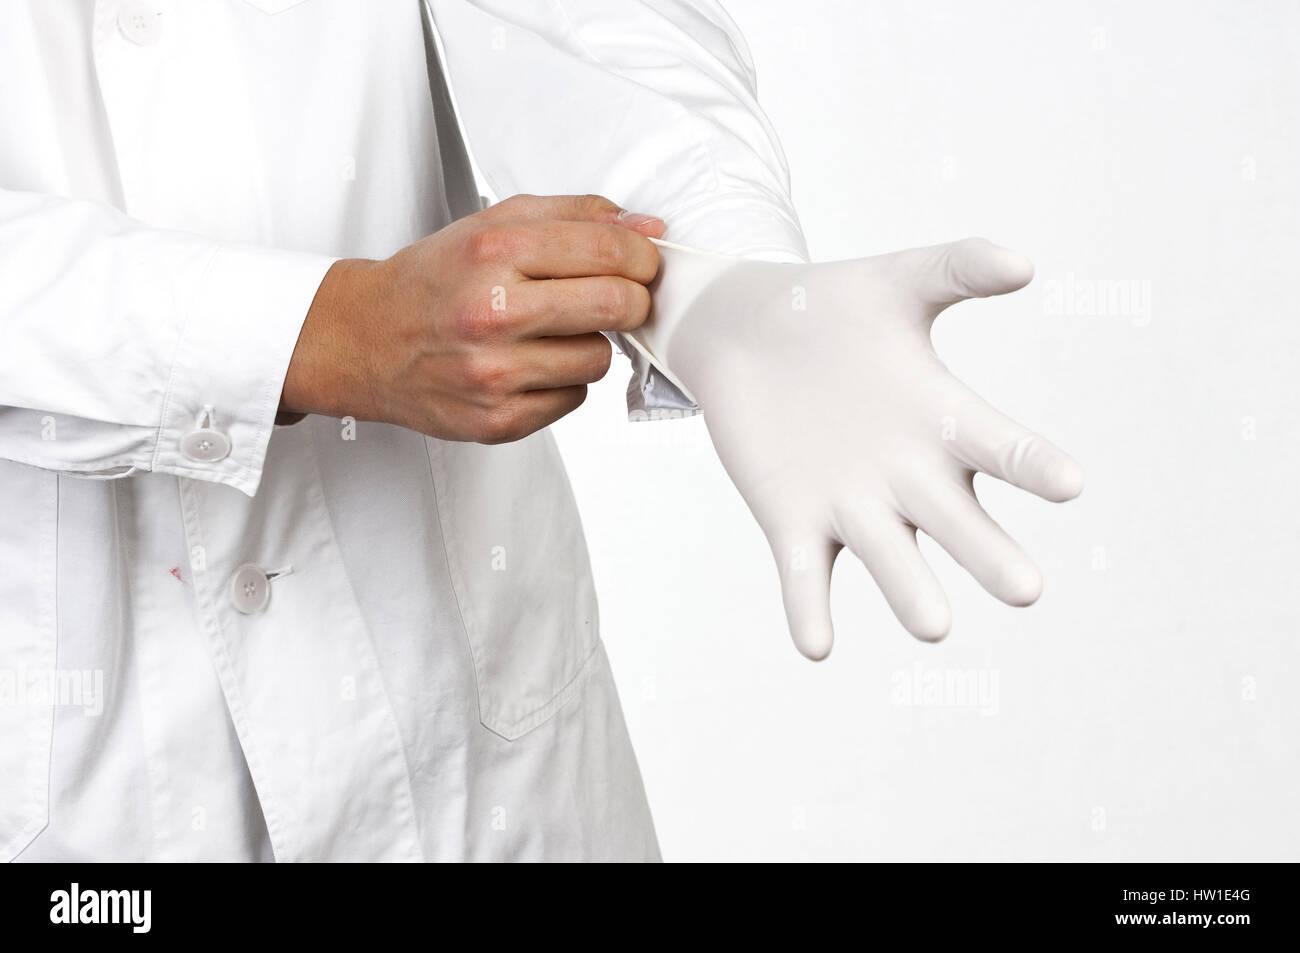 Protection against infections, Schutz gegen Infektionen - Stock Image